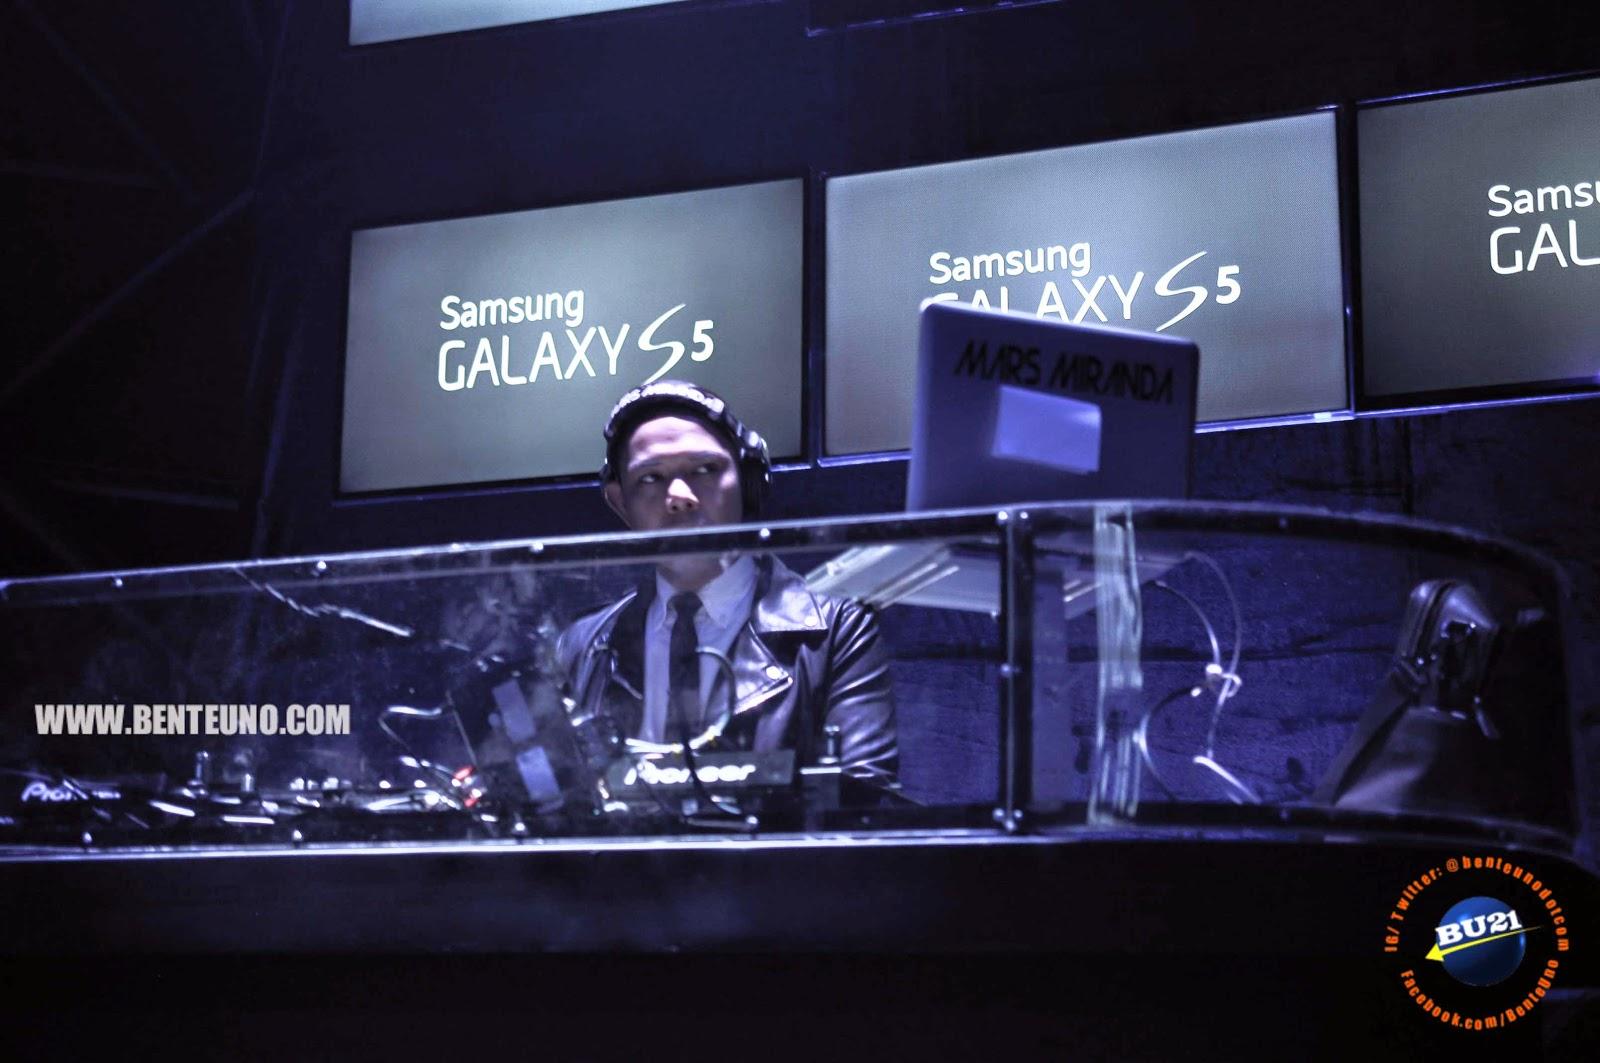 DJ Mars Miranda during the Galaxy S5 Launch at the Samsung Hall